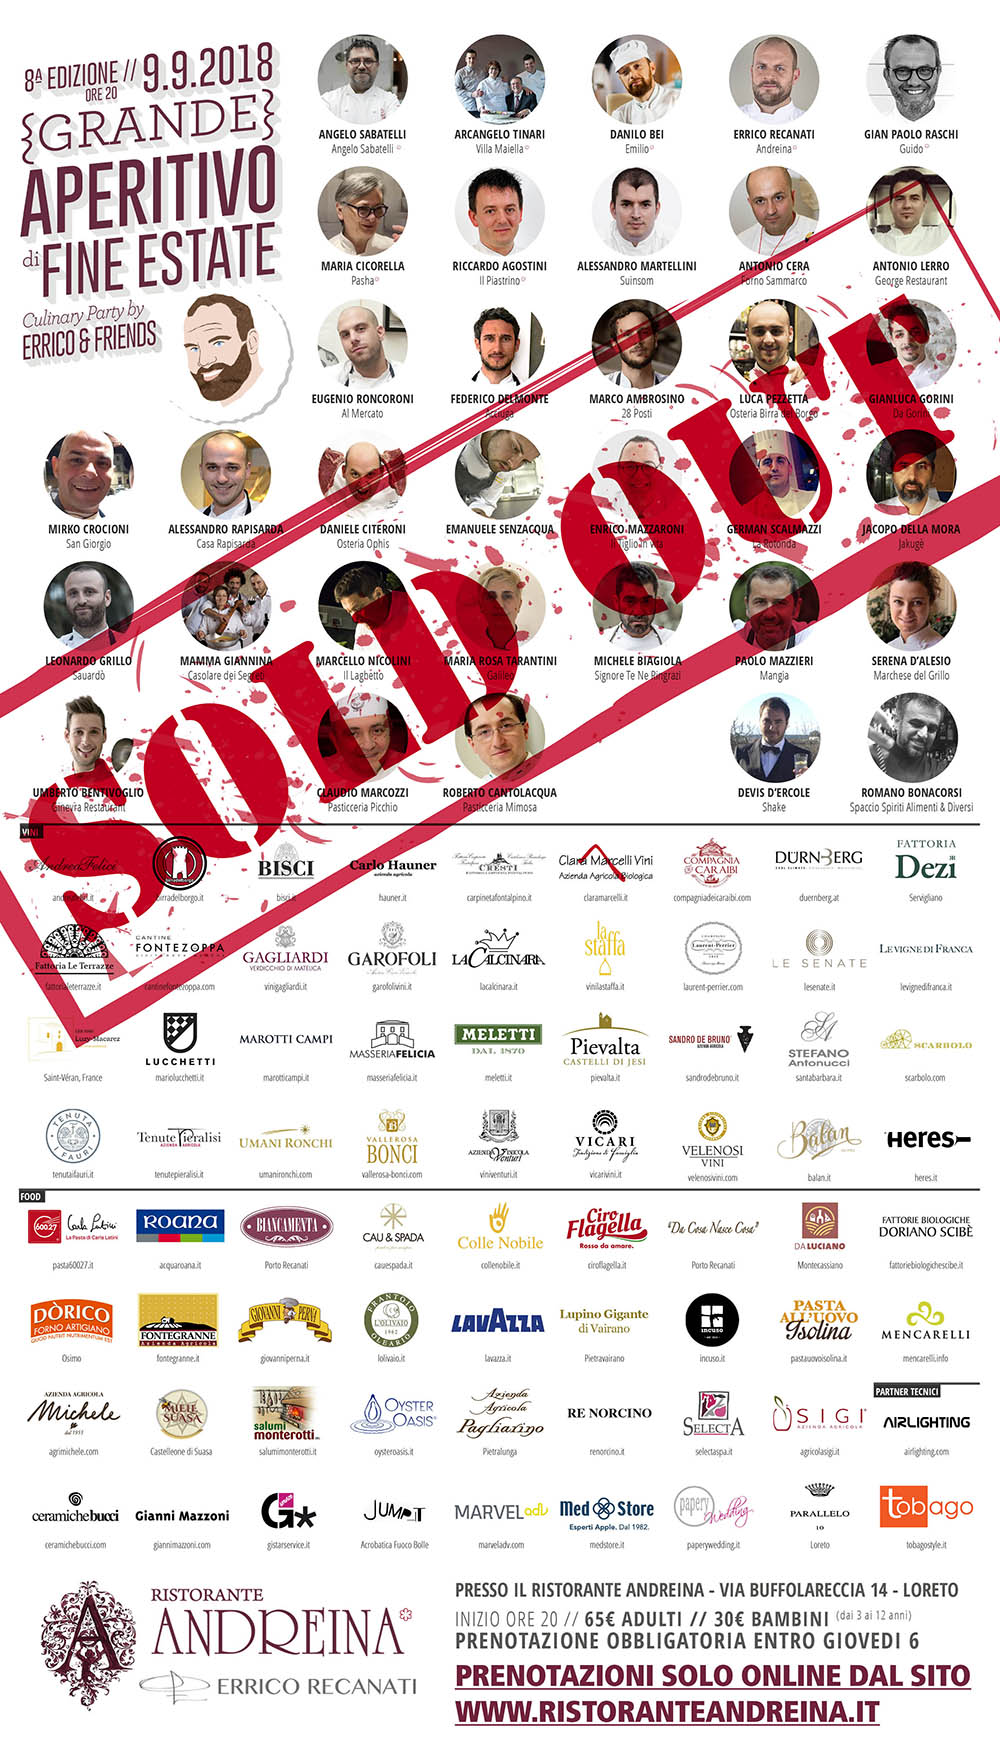 01 sold out_ERRICO RECANATI RISTORANTE ANDREINA Locandina GAFE 2018_V04